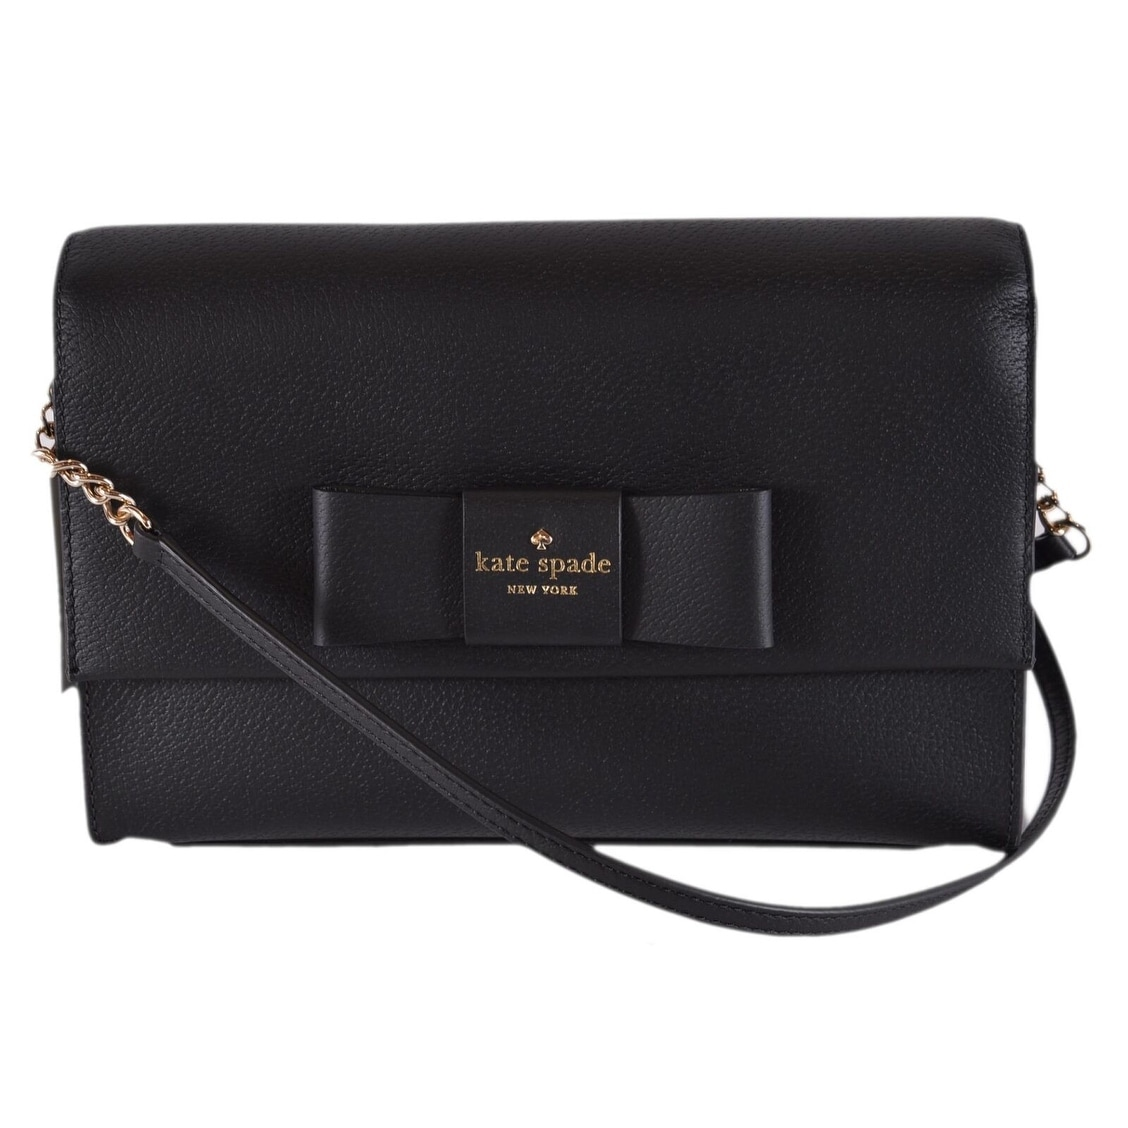 Kate Spade Black Leather Robinson Street Zanni Crossbody Bag Purse - 10.5